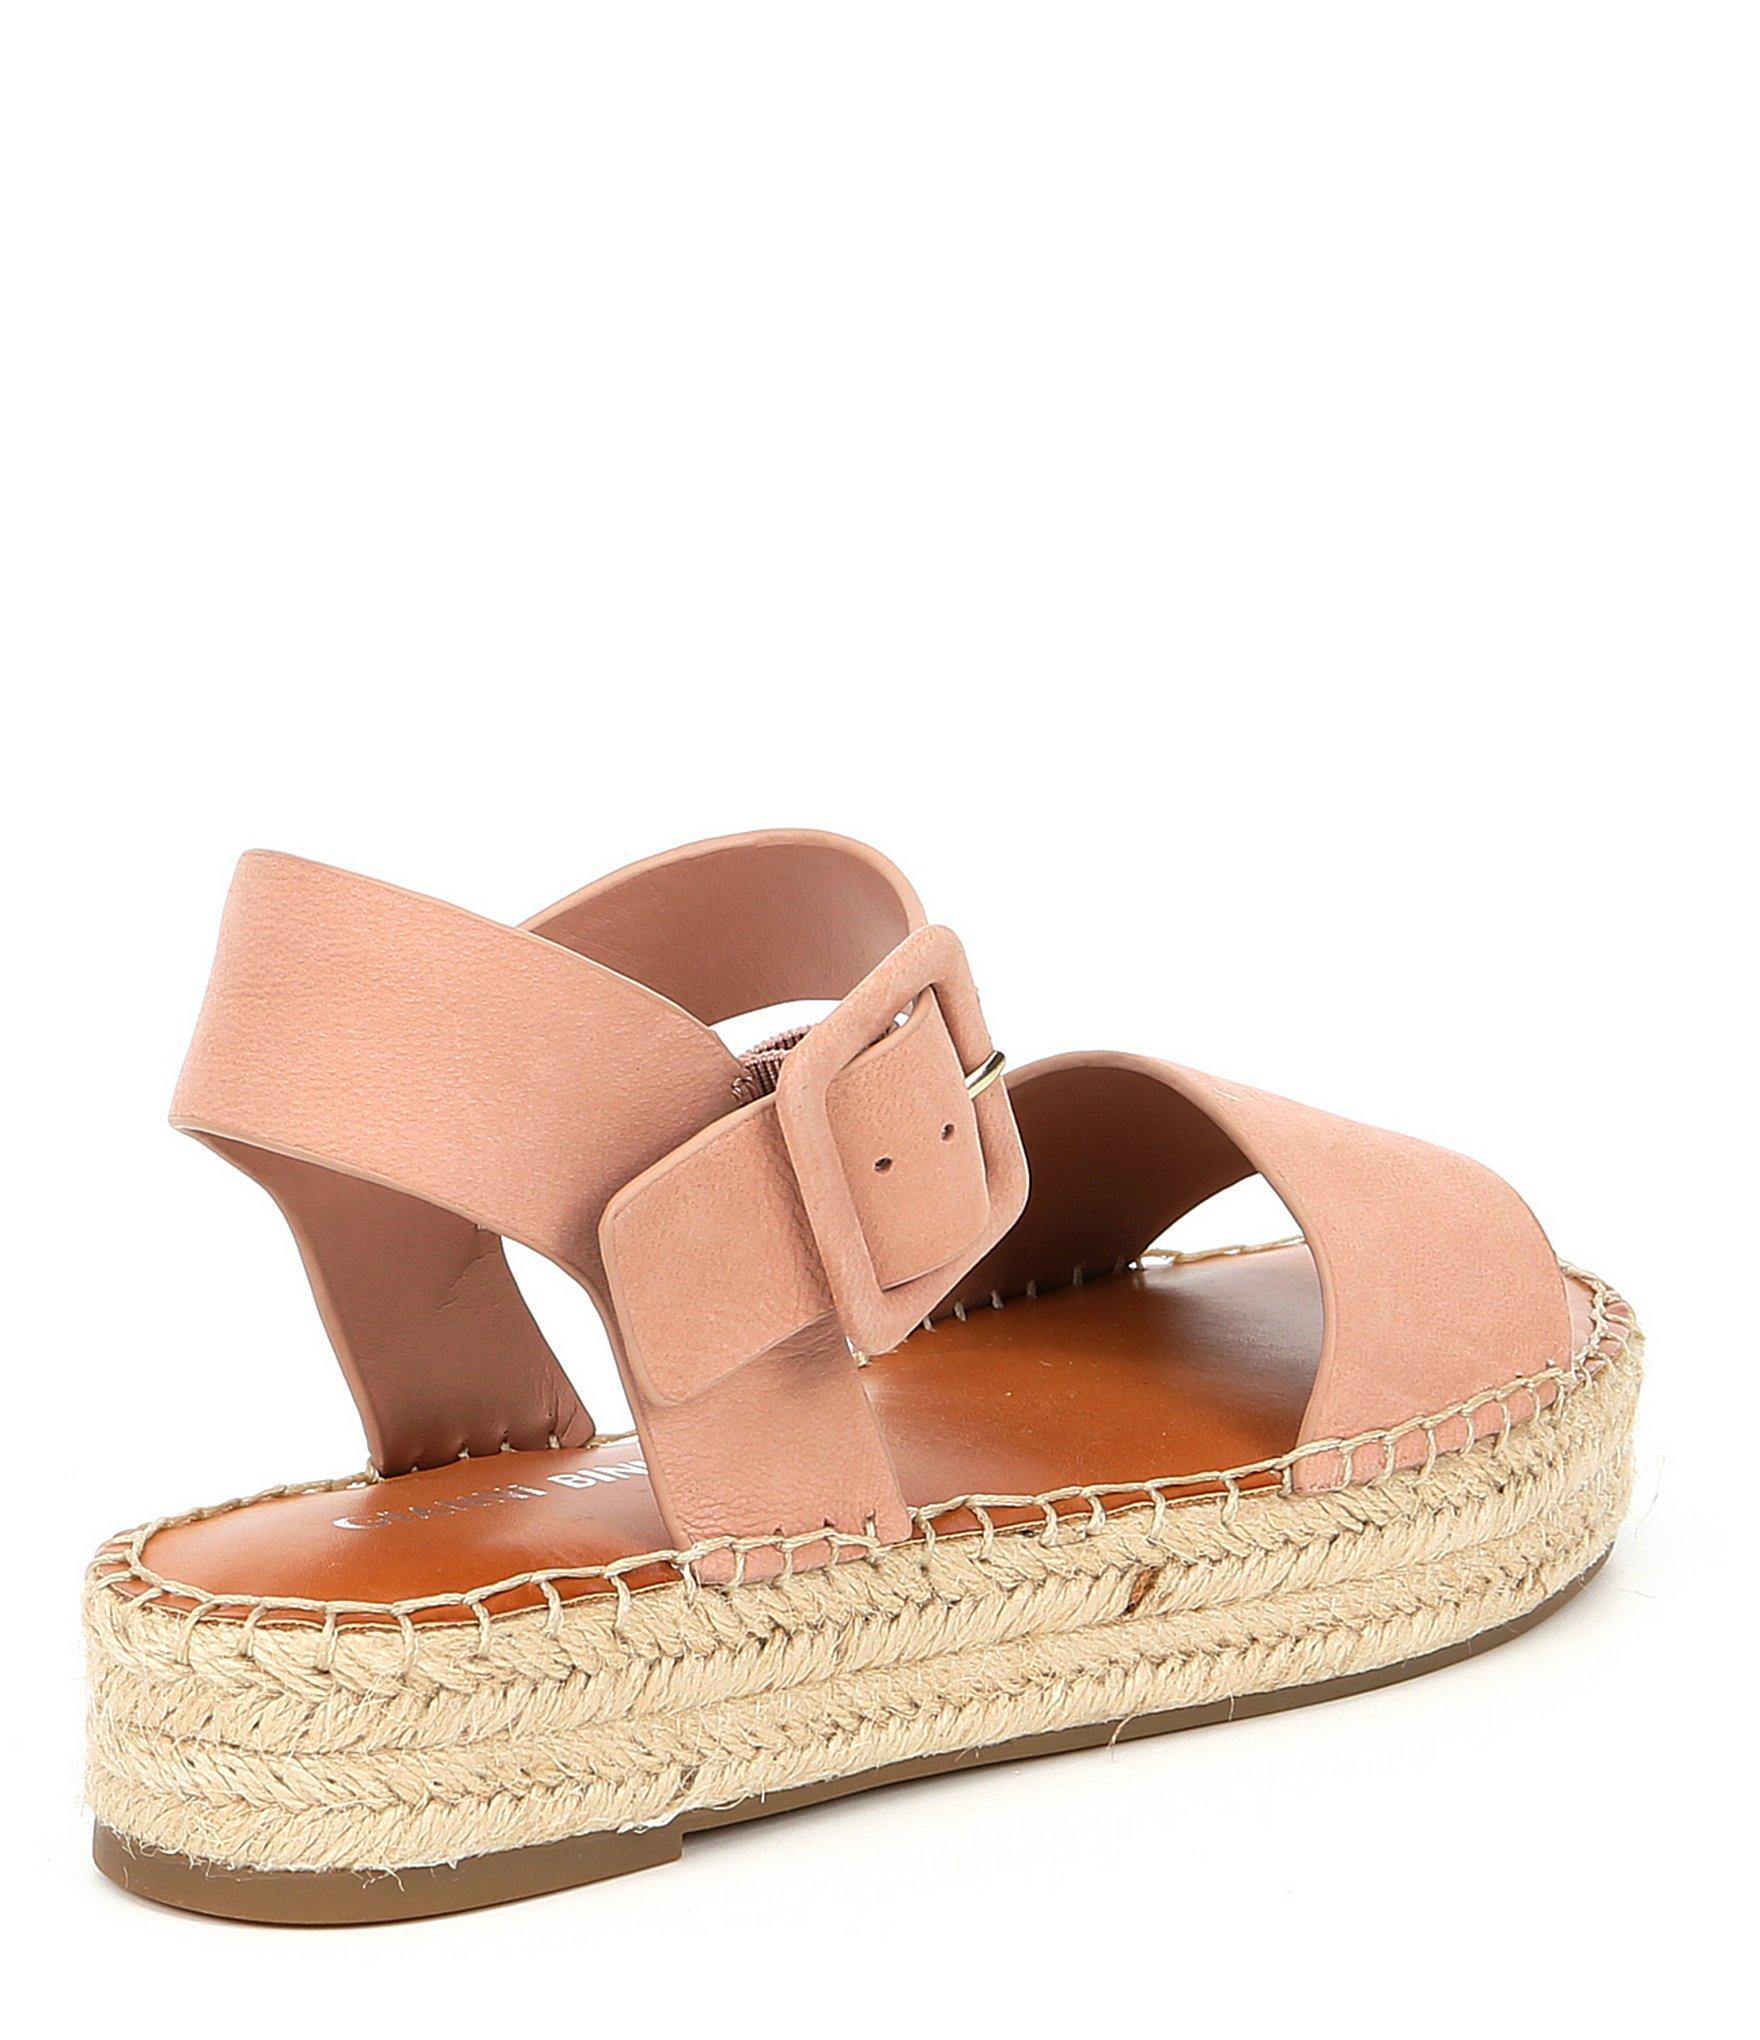 b29a91163897 Gianni Bini - Multicolor Kaygan Nubuck Leather Espadrille Flatform Sandals  - Lyst. View fullscreen